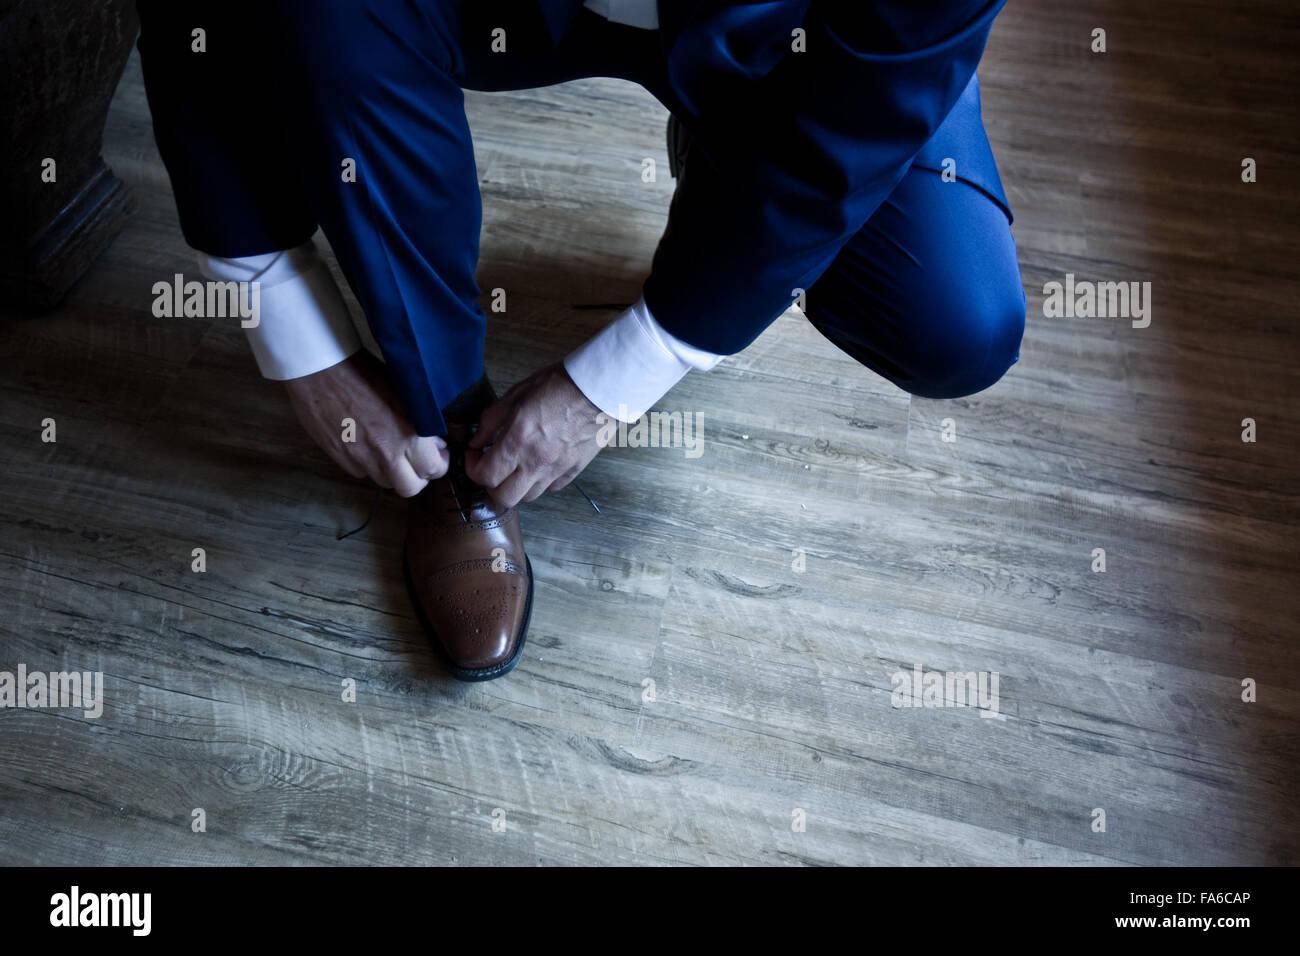 Man tying his shoelaces - Stock Image